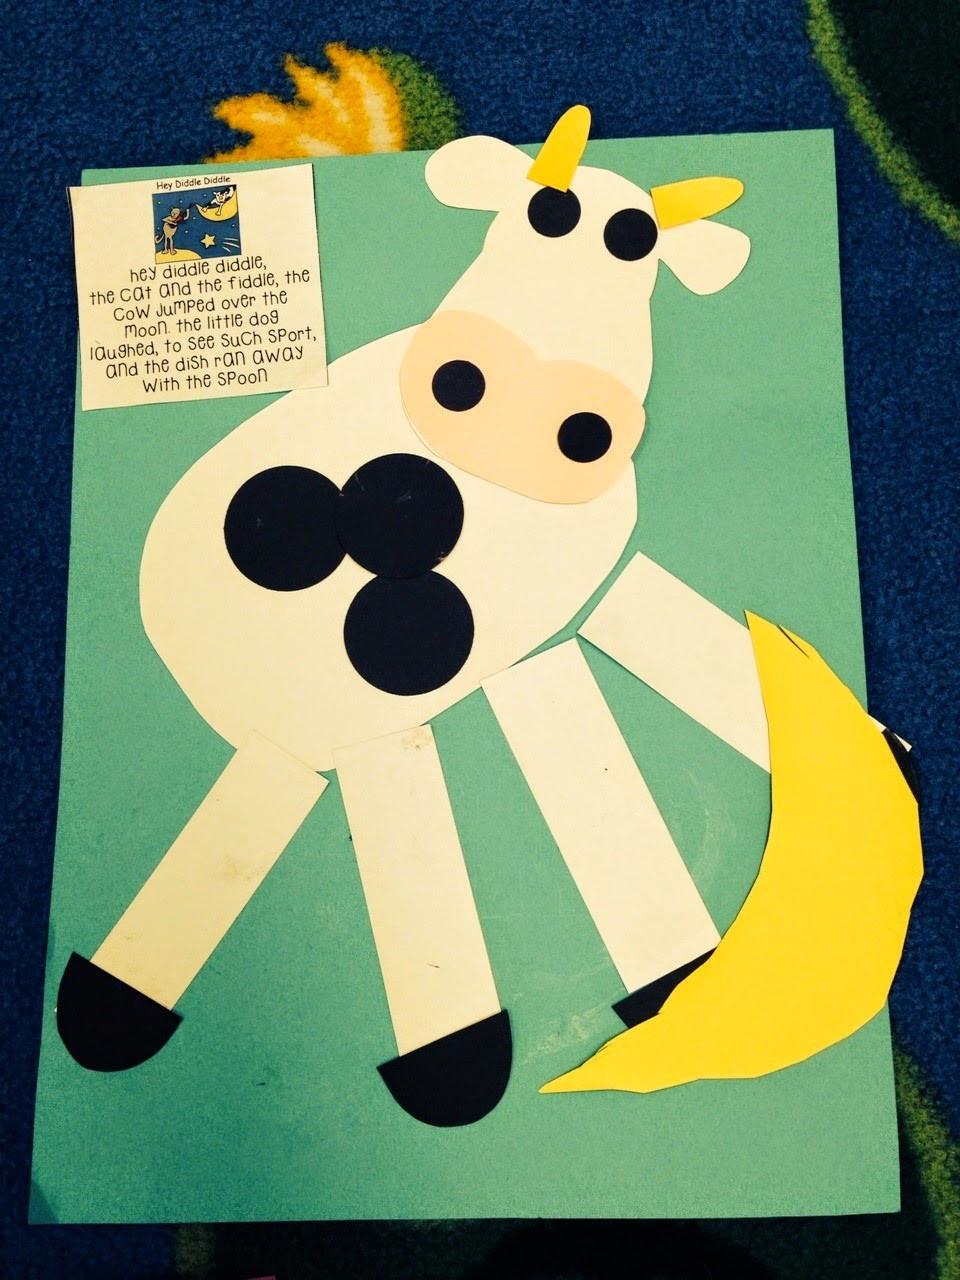 Best ideas about Preschool Arts And Craft . Save or Pin Preschool Wonders Nursery Rhymes Second Verse Now.